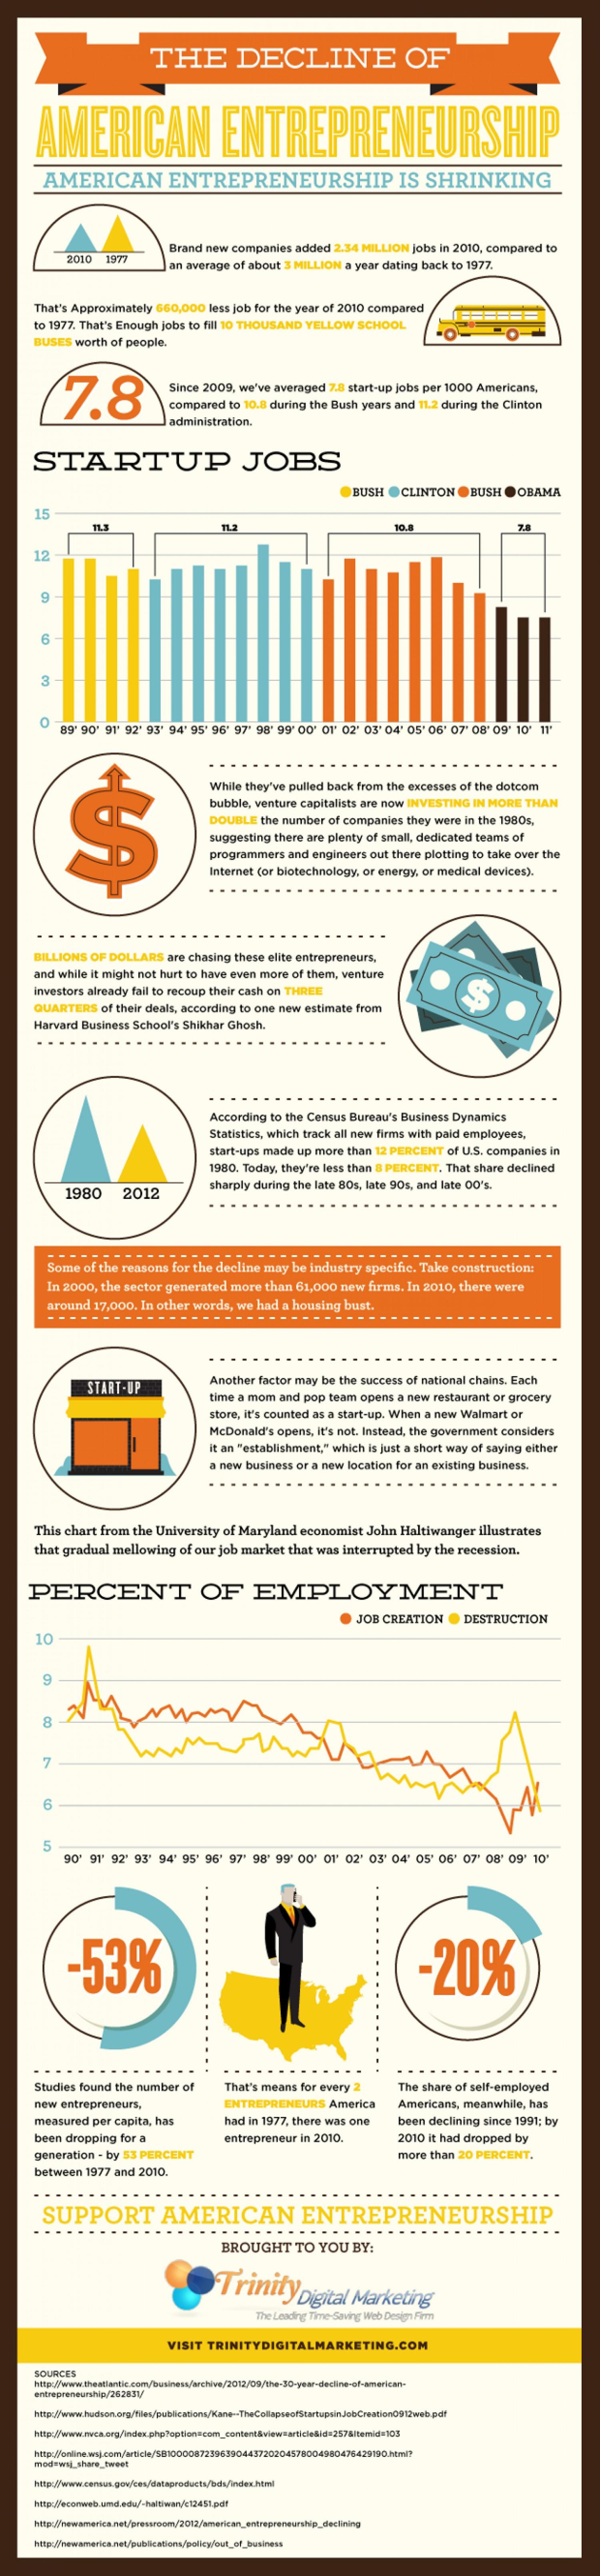 The Decline of American Entrepreneurship